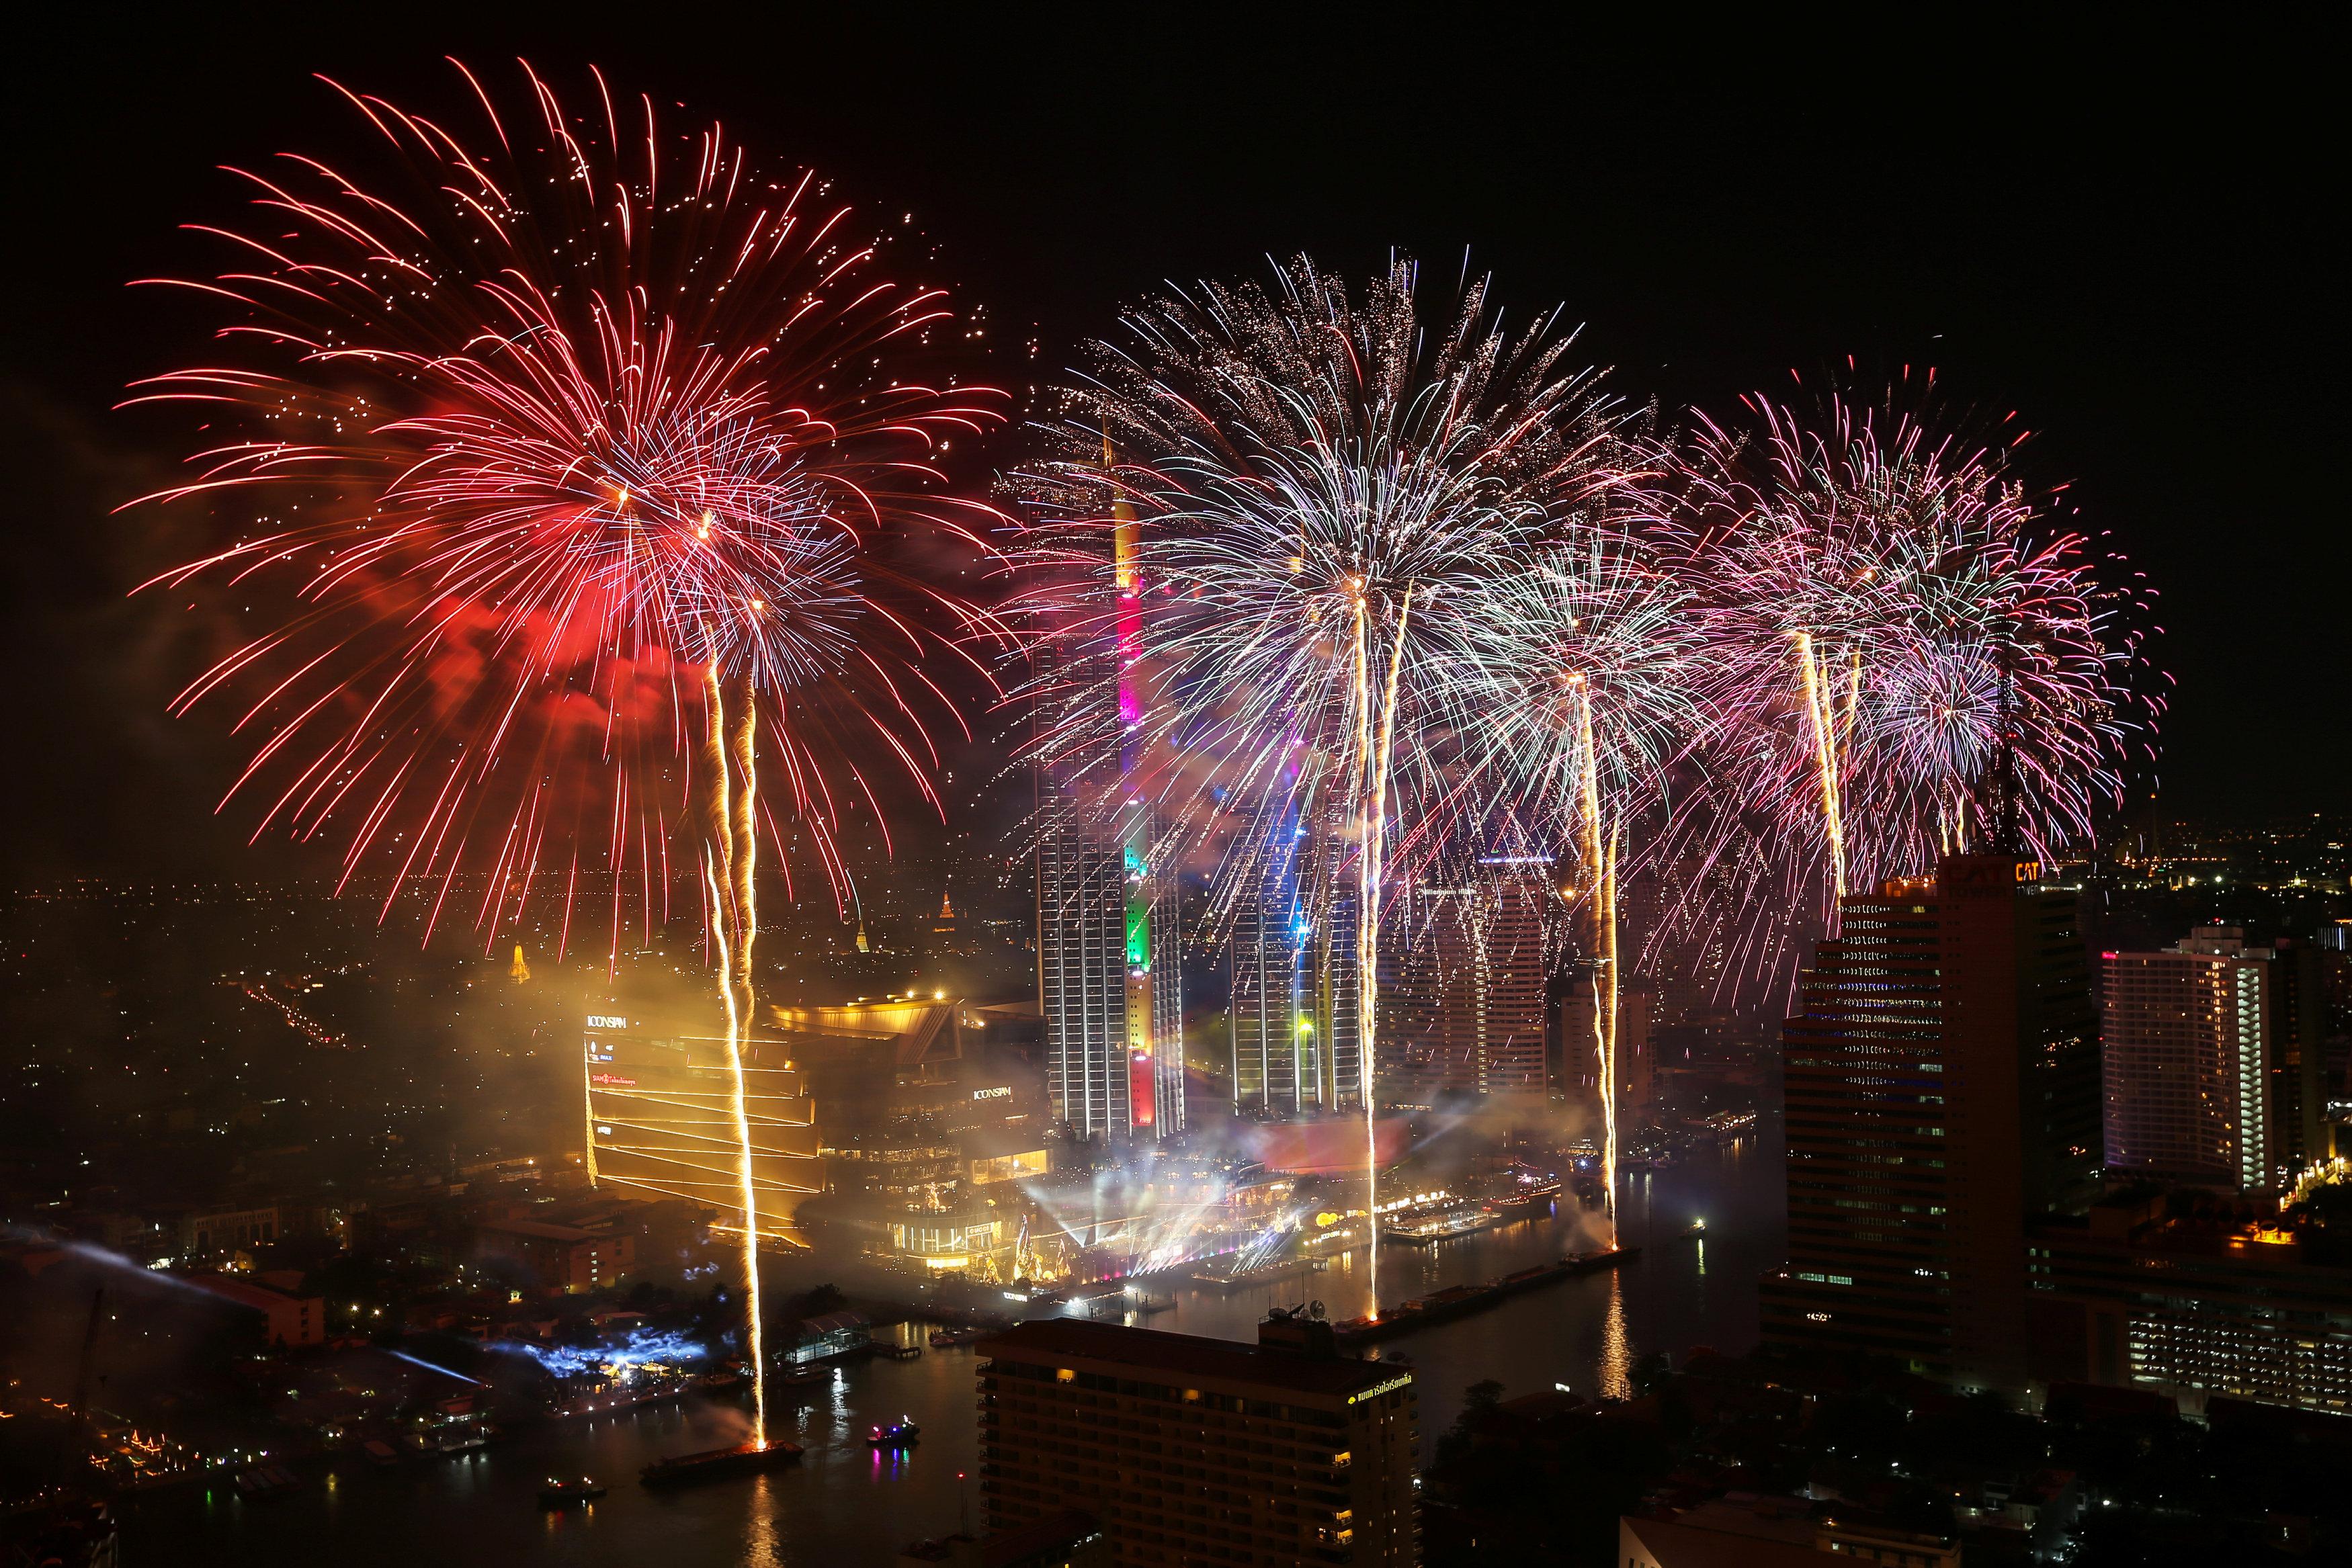 احتفالات تايلاند